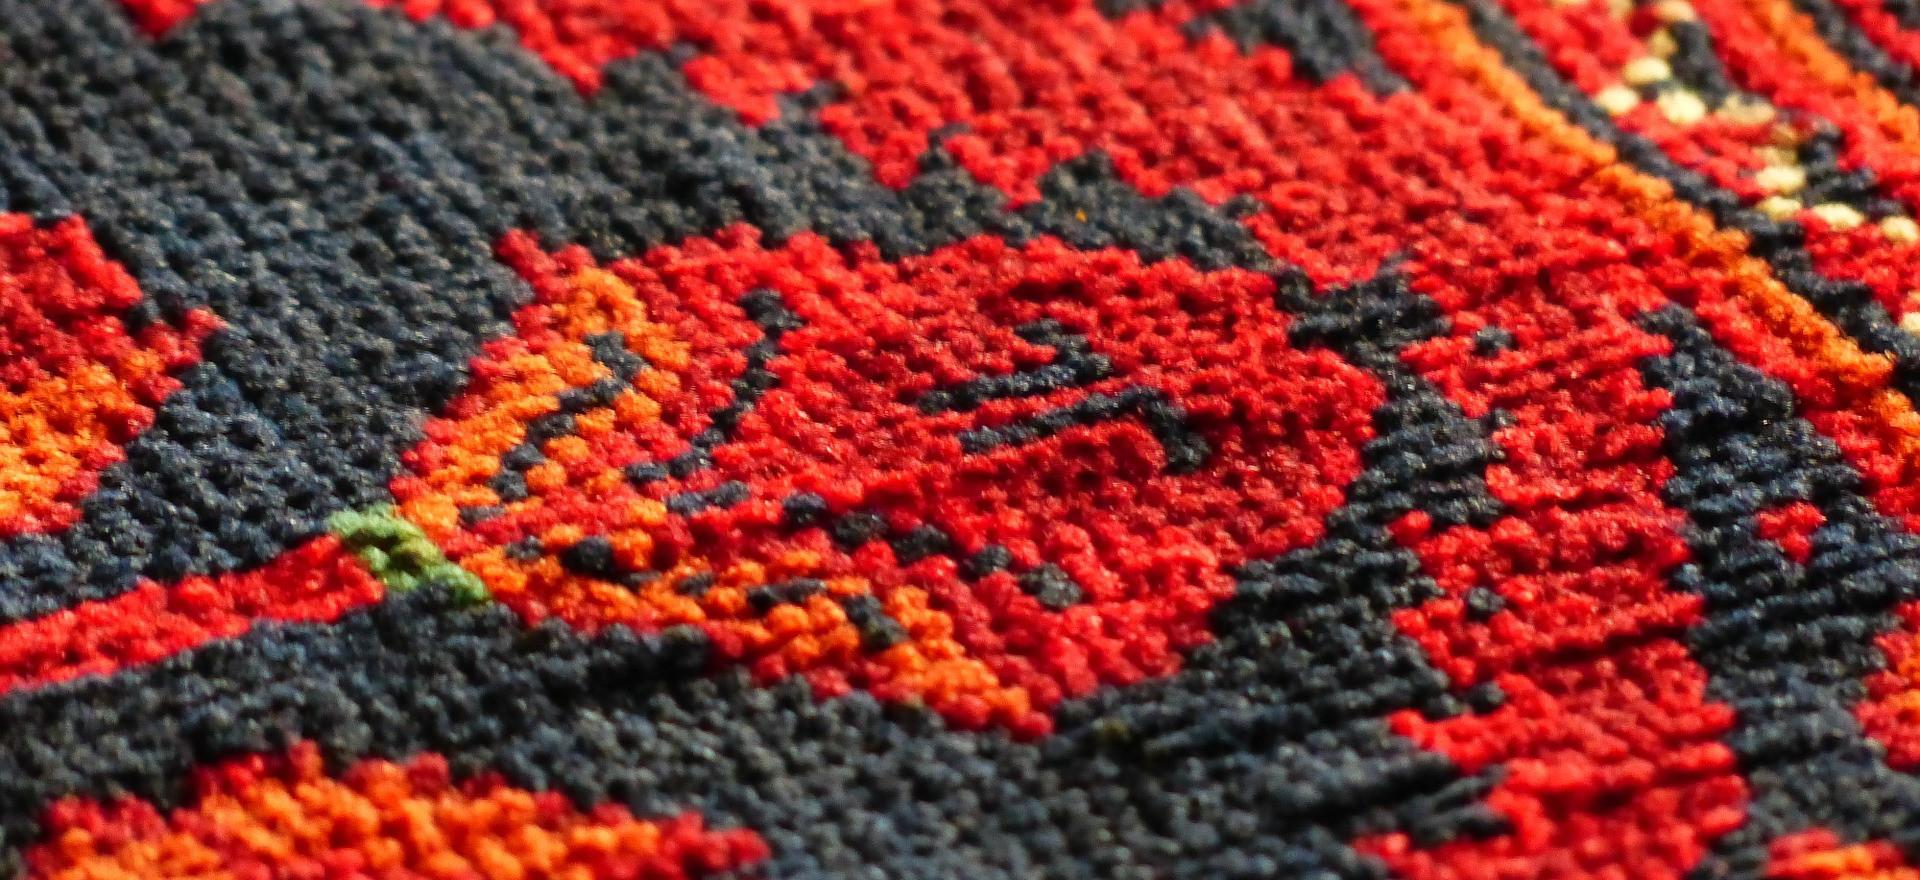 carpet-100085_1920.jpg